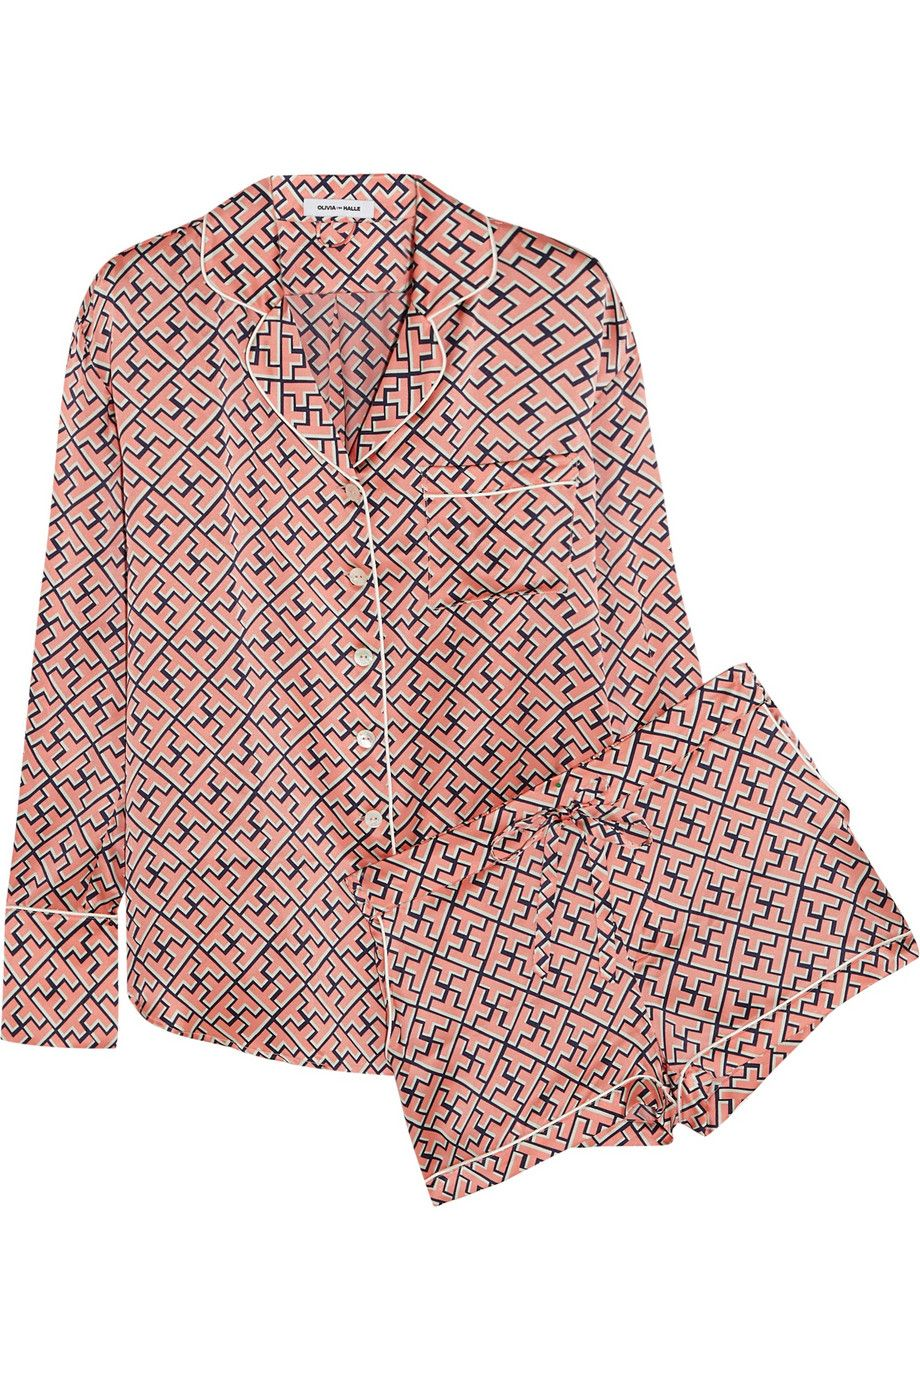 Olivia von Halle   Alba Mizuki printed silk-satin pajama set   NET-A